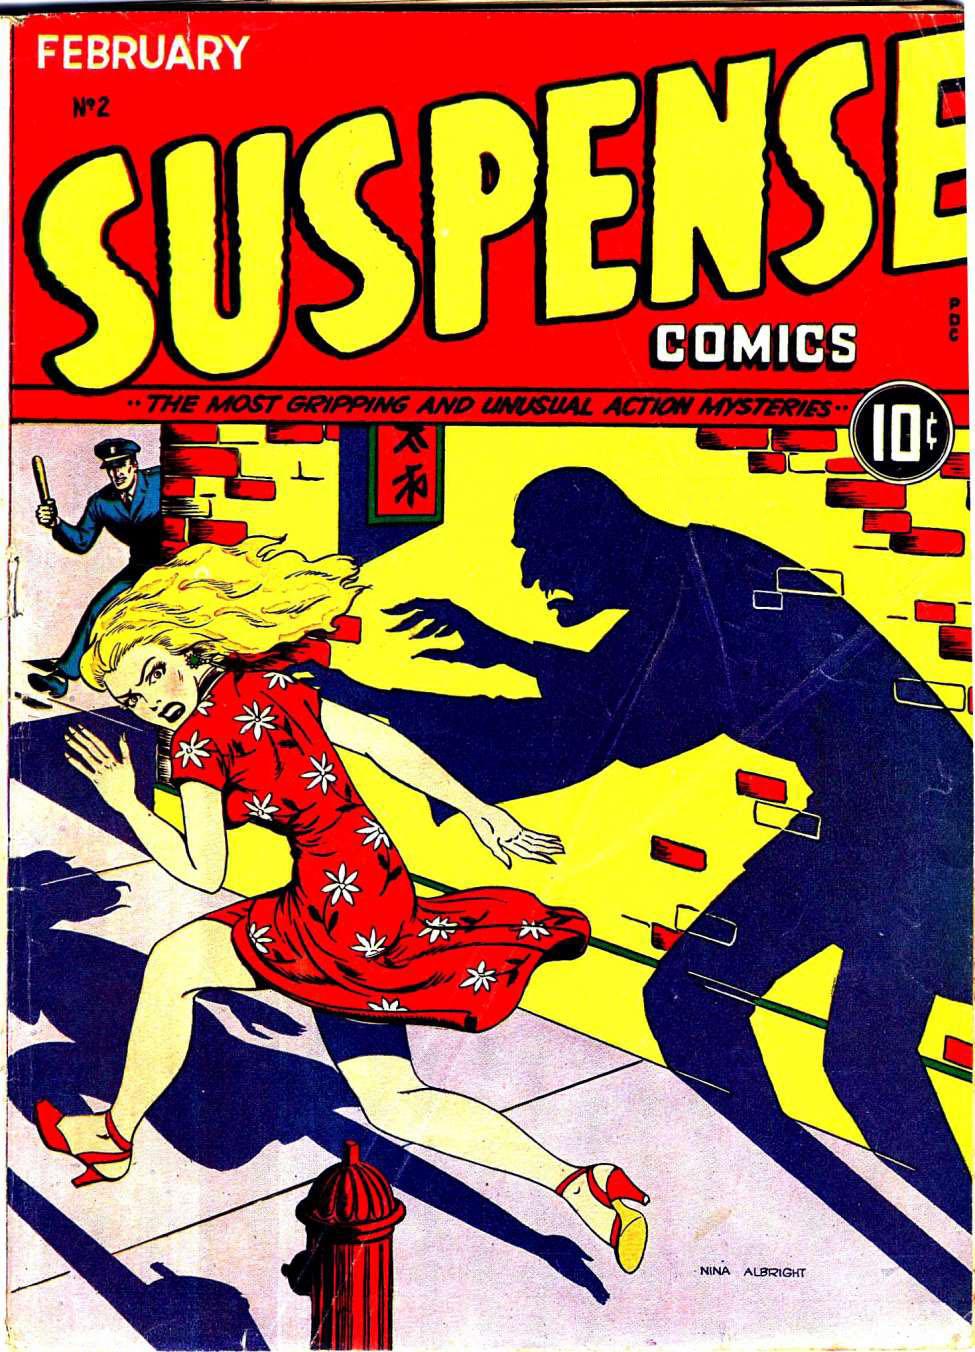 Suspense Comics #2, Holyoke